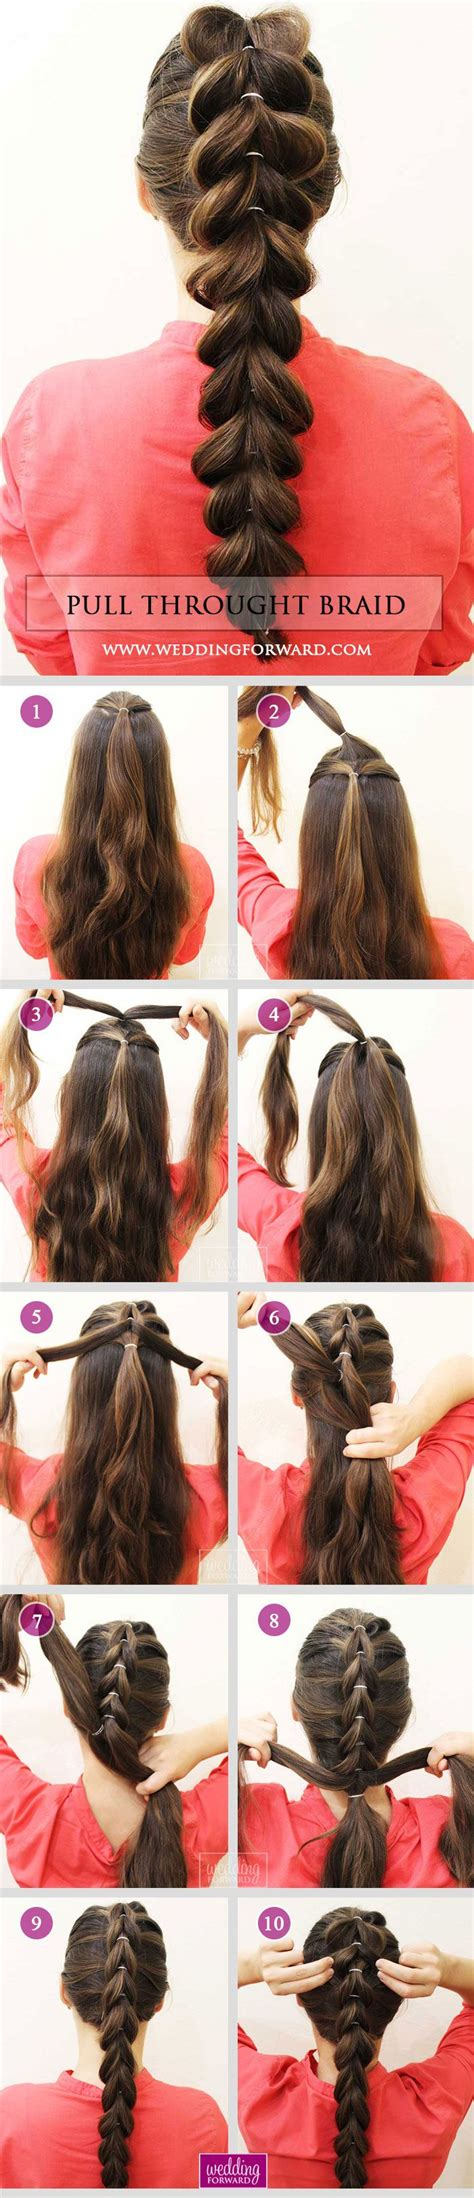 diy wedding hairstyles step by step 36 braided wedding hair ideas you will more braided wedding hair tutorials and wedding ideas